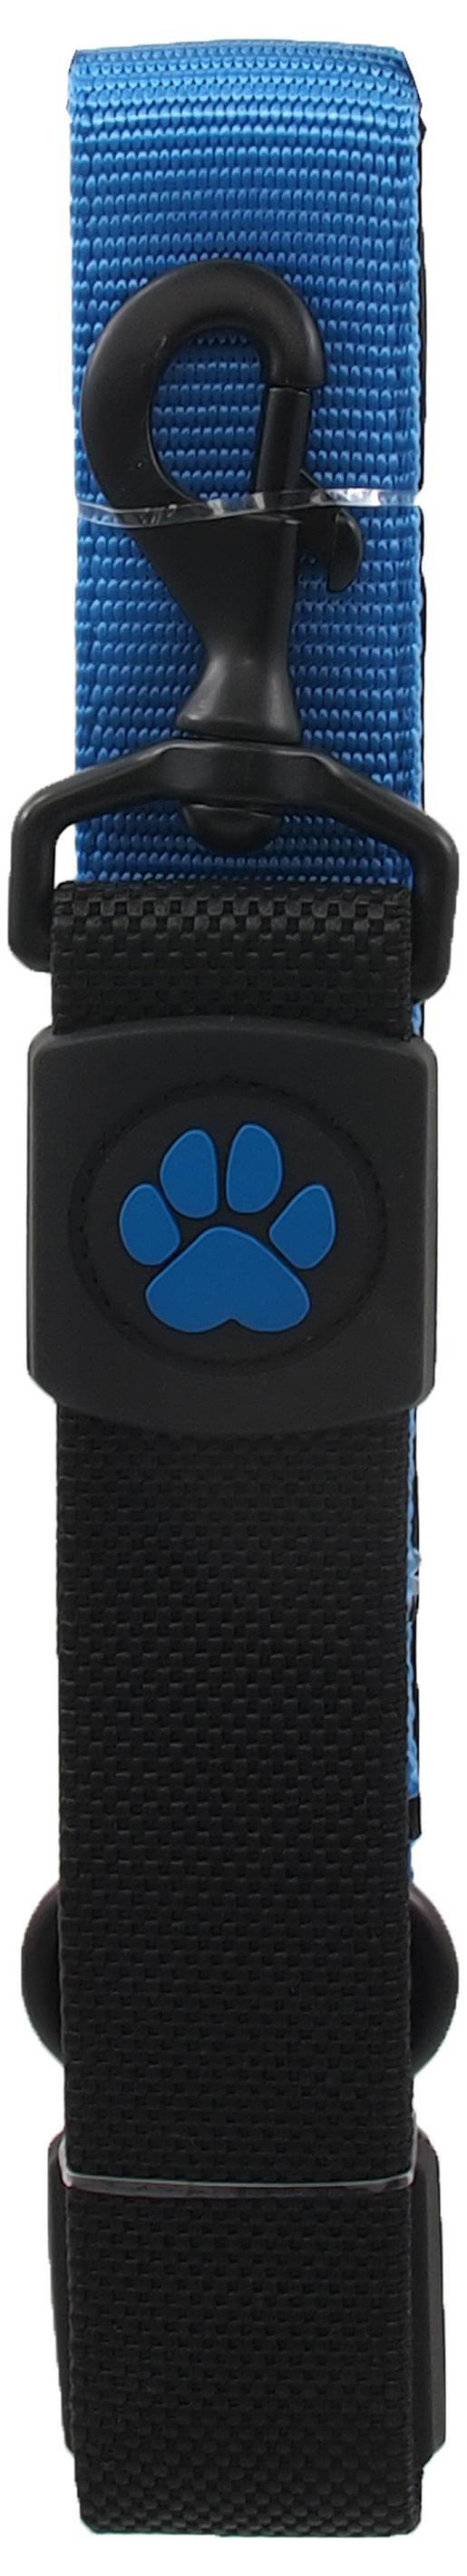 Dog Fantasy Vodítko Active Dog Bungee Neoprene XL modré 3,8x55cm